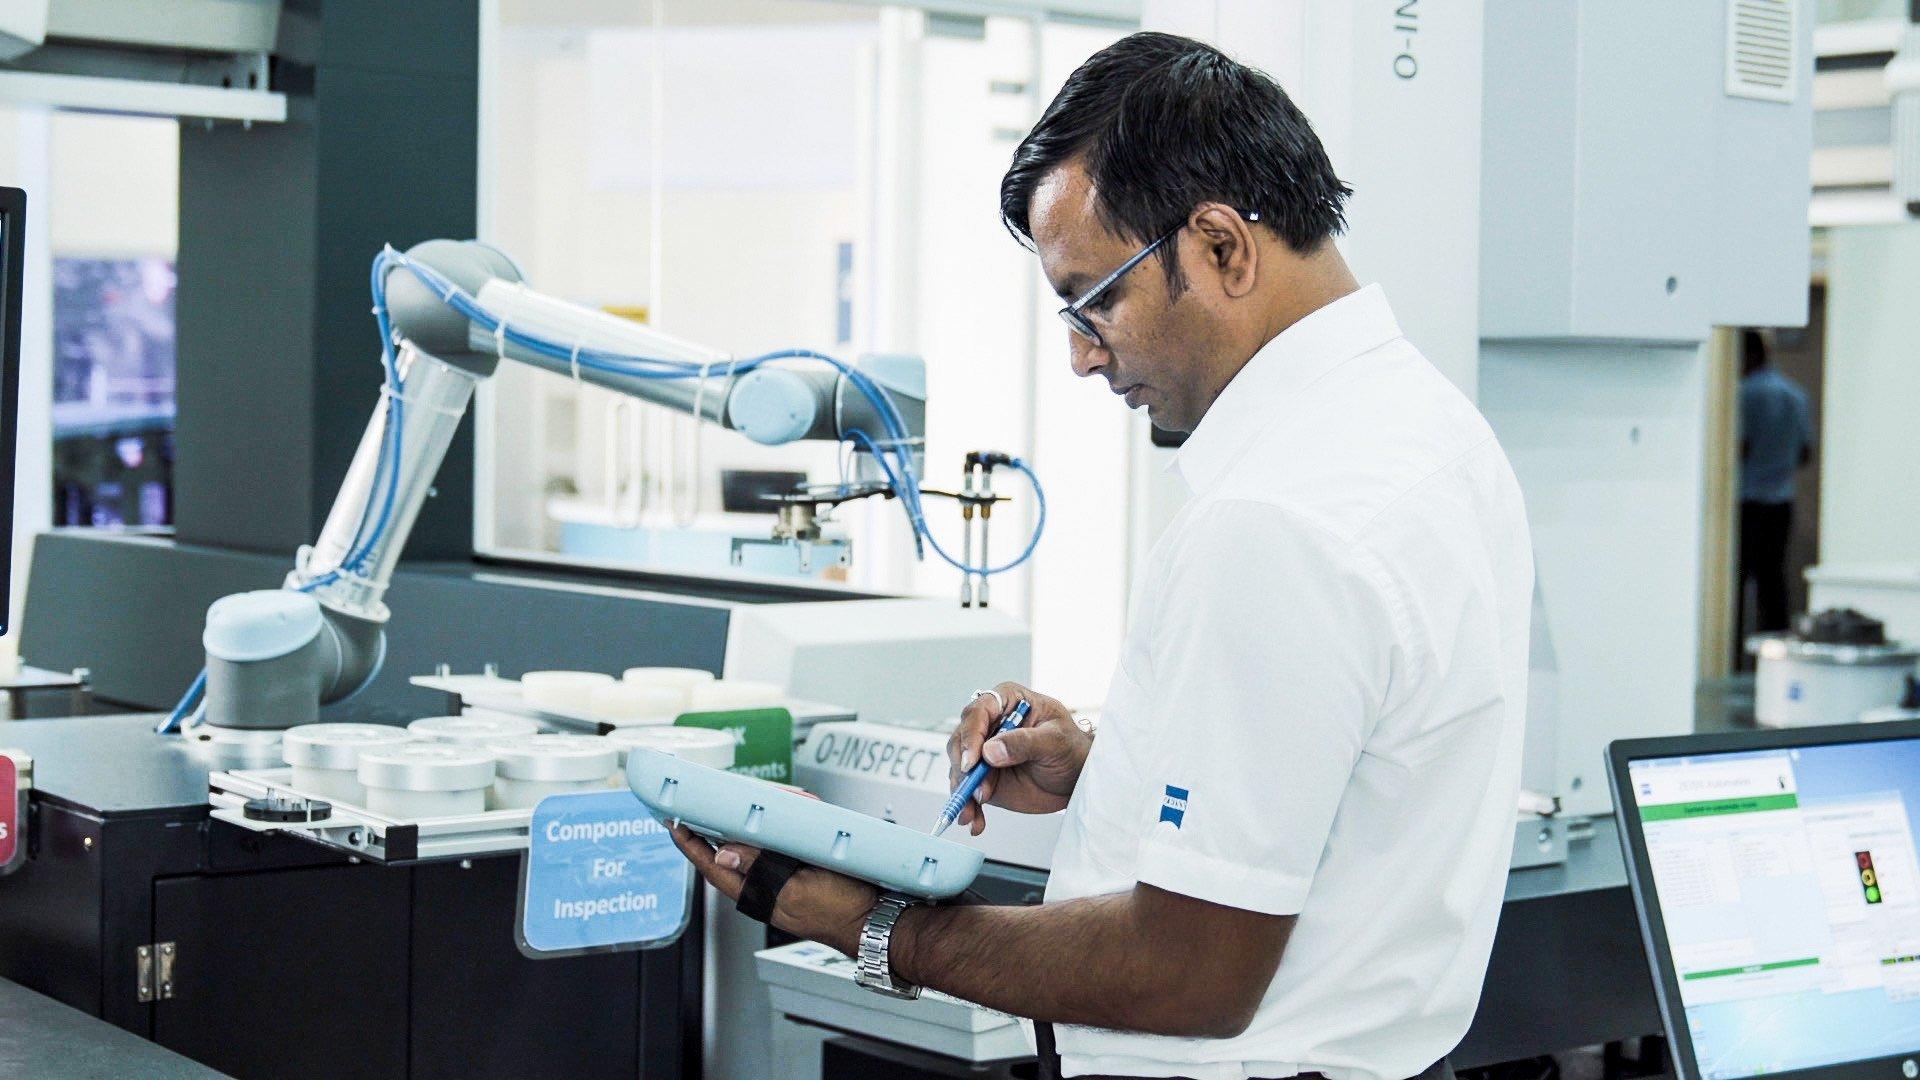 Using UR5 at Carl Zeiss India Metrology Tech Centre, Bangalore